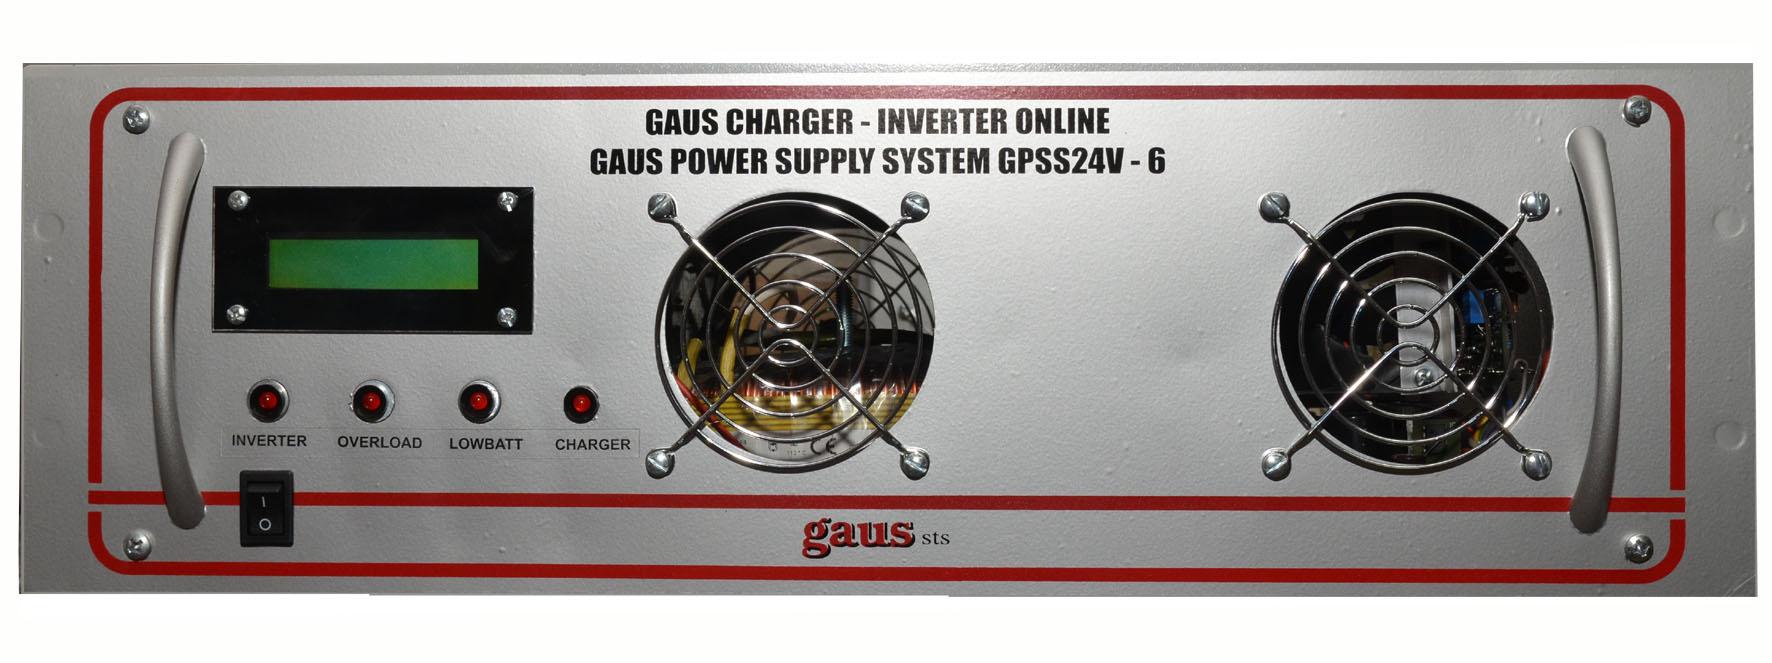 GPSS48V-6_3F650WCH